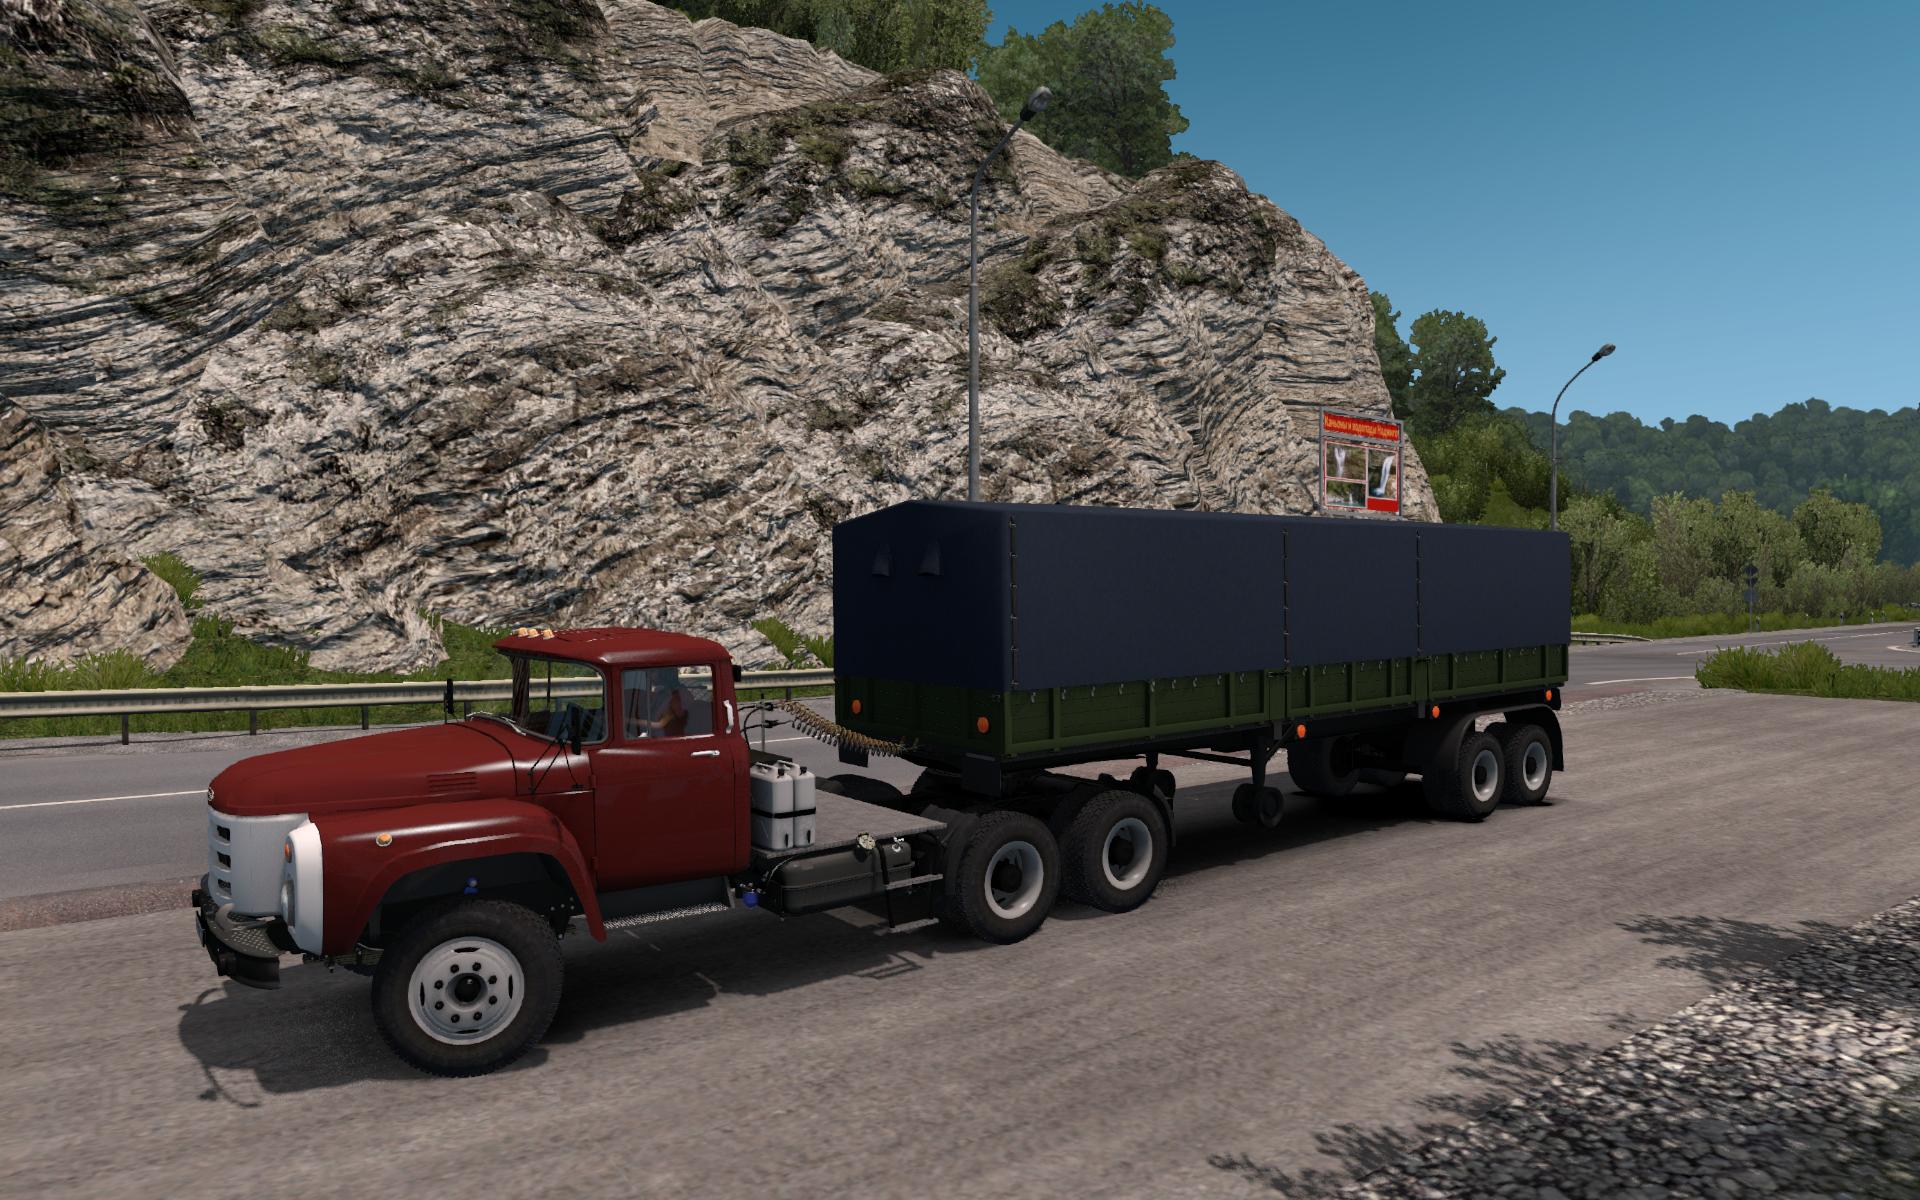 ЗиЛ-133ВЯ + ОдАЗ-760 - Euro Truck Simulator 2 ЗиЛ-133ВЯ